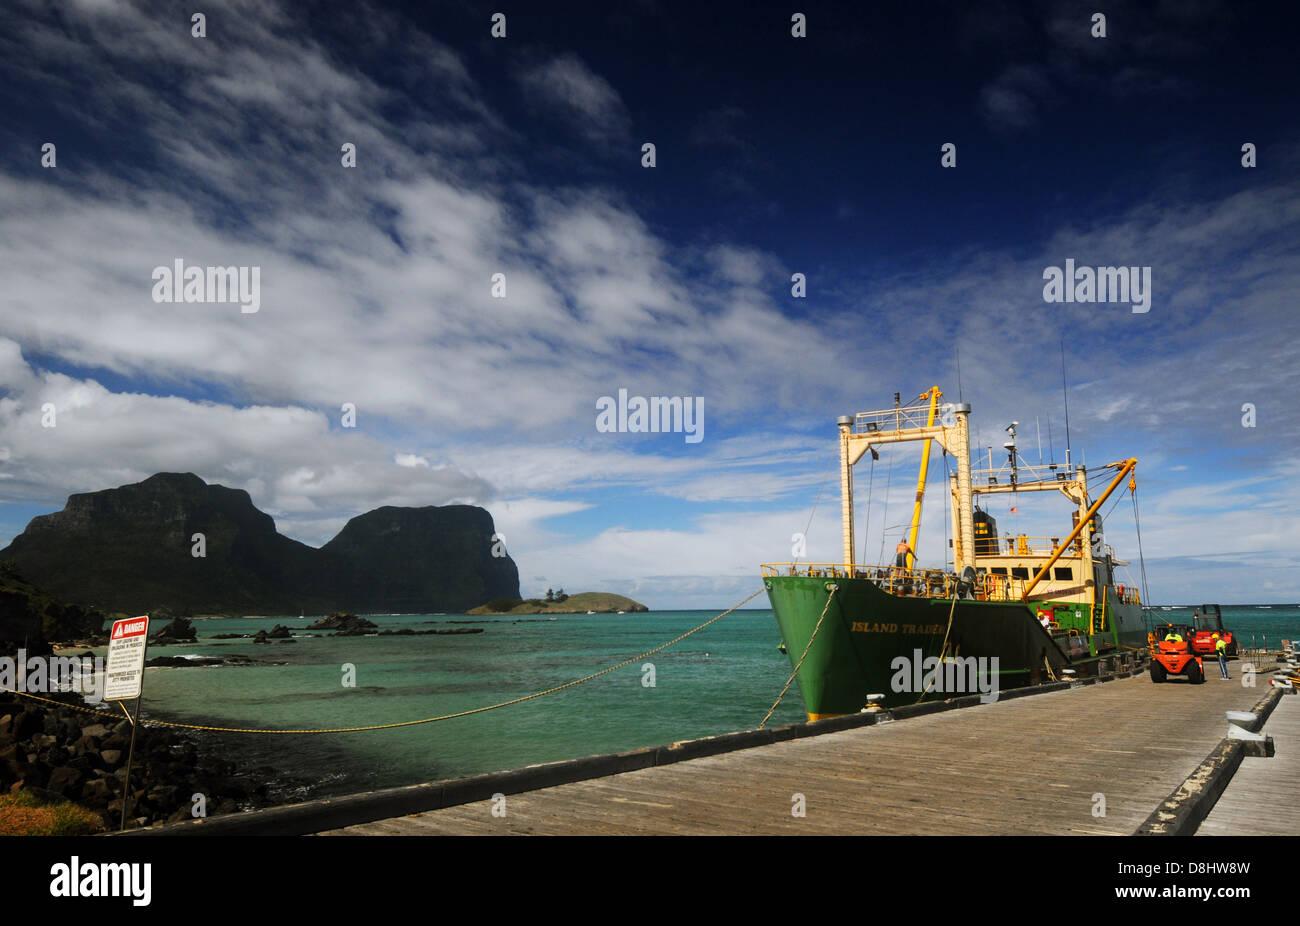 Resupply ship 'Island Trader' at dock, Lord Howe Island, Australia. No PR or MR - Stock Image